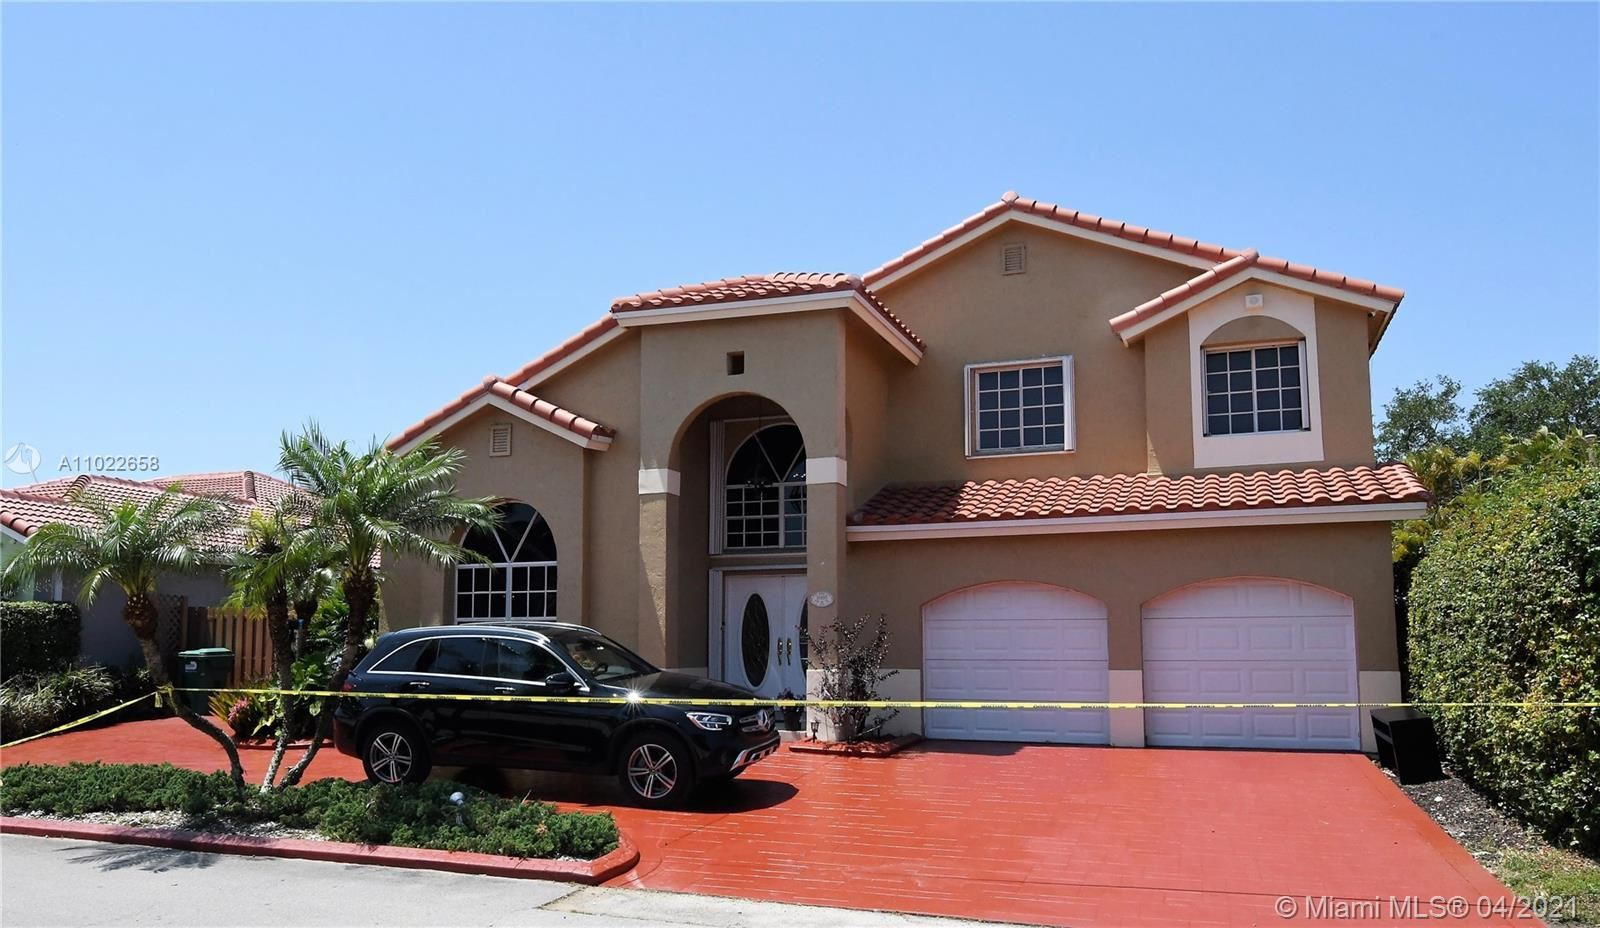 10950 SW 161st Pl, Miami, FL 33196 - #: A11022658